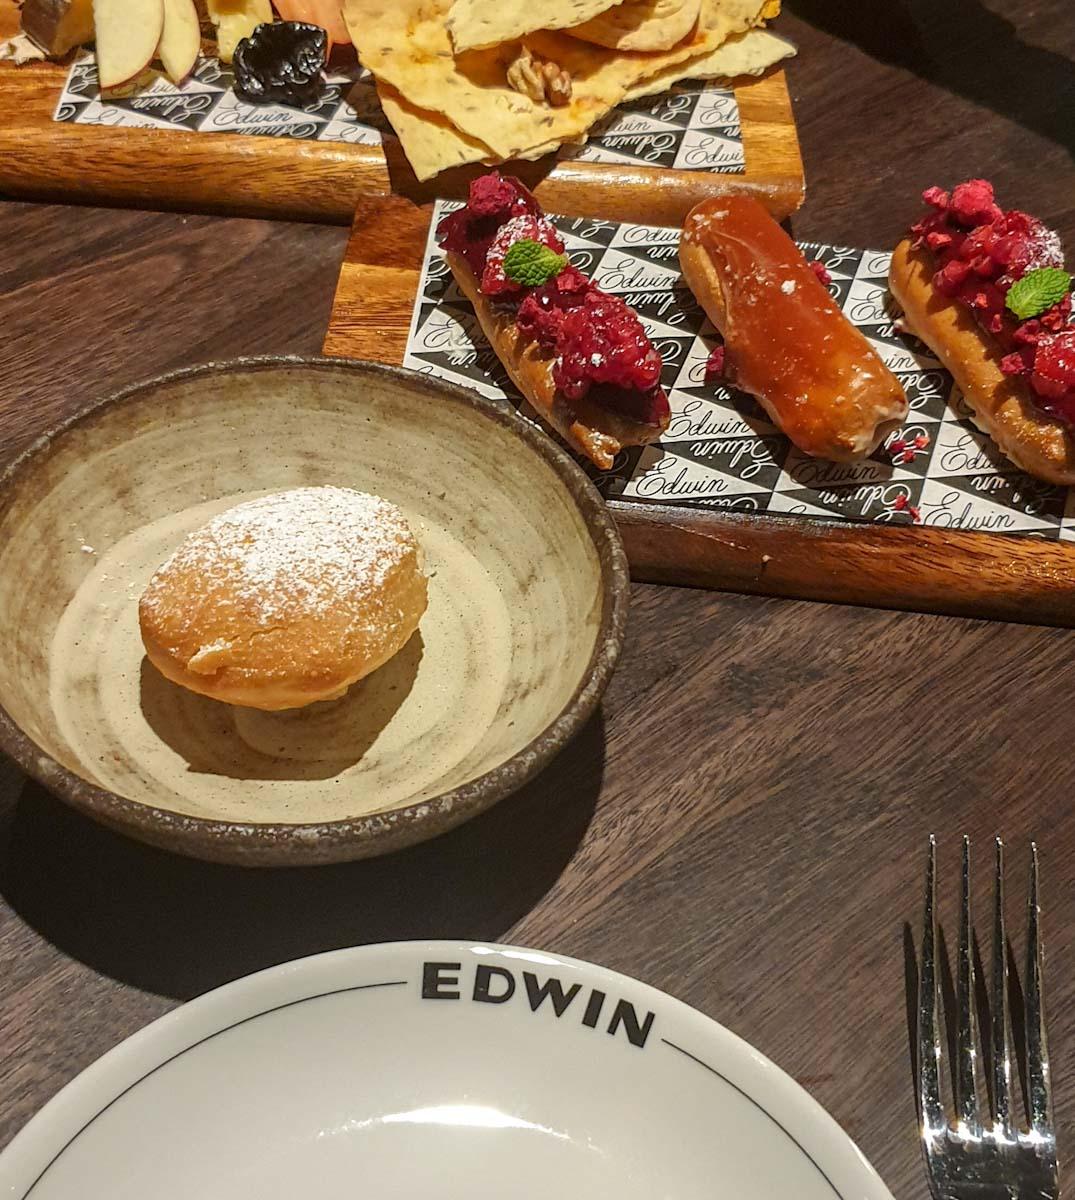 Dinner at Edwins